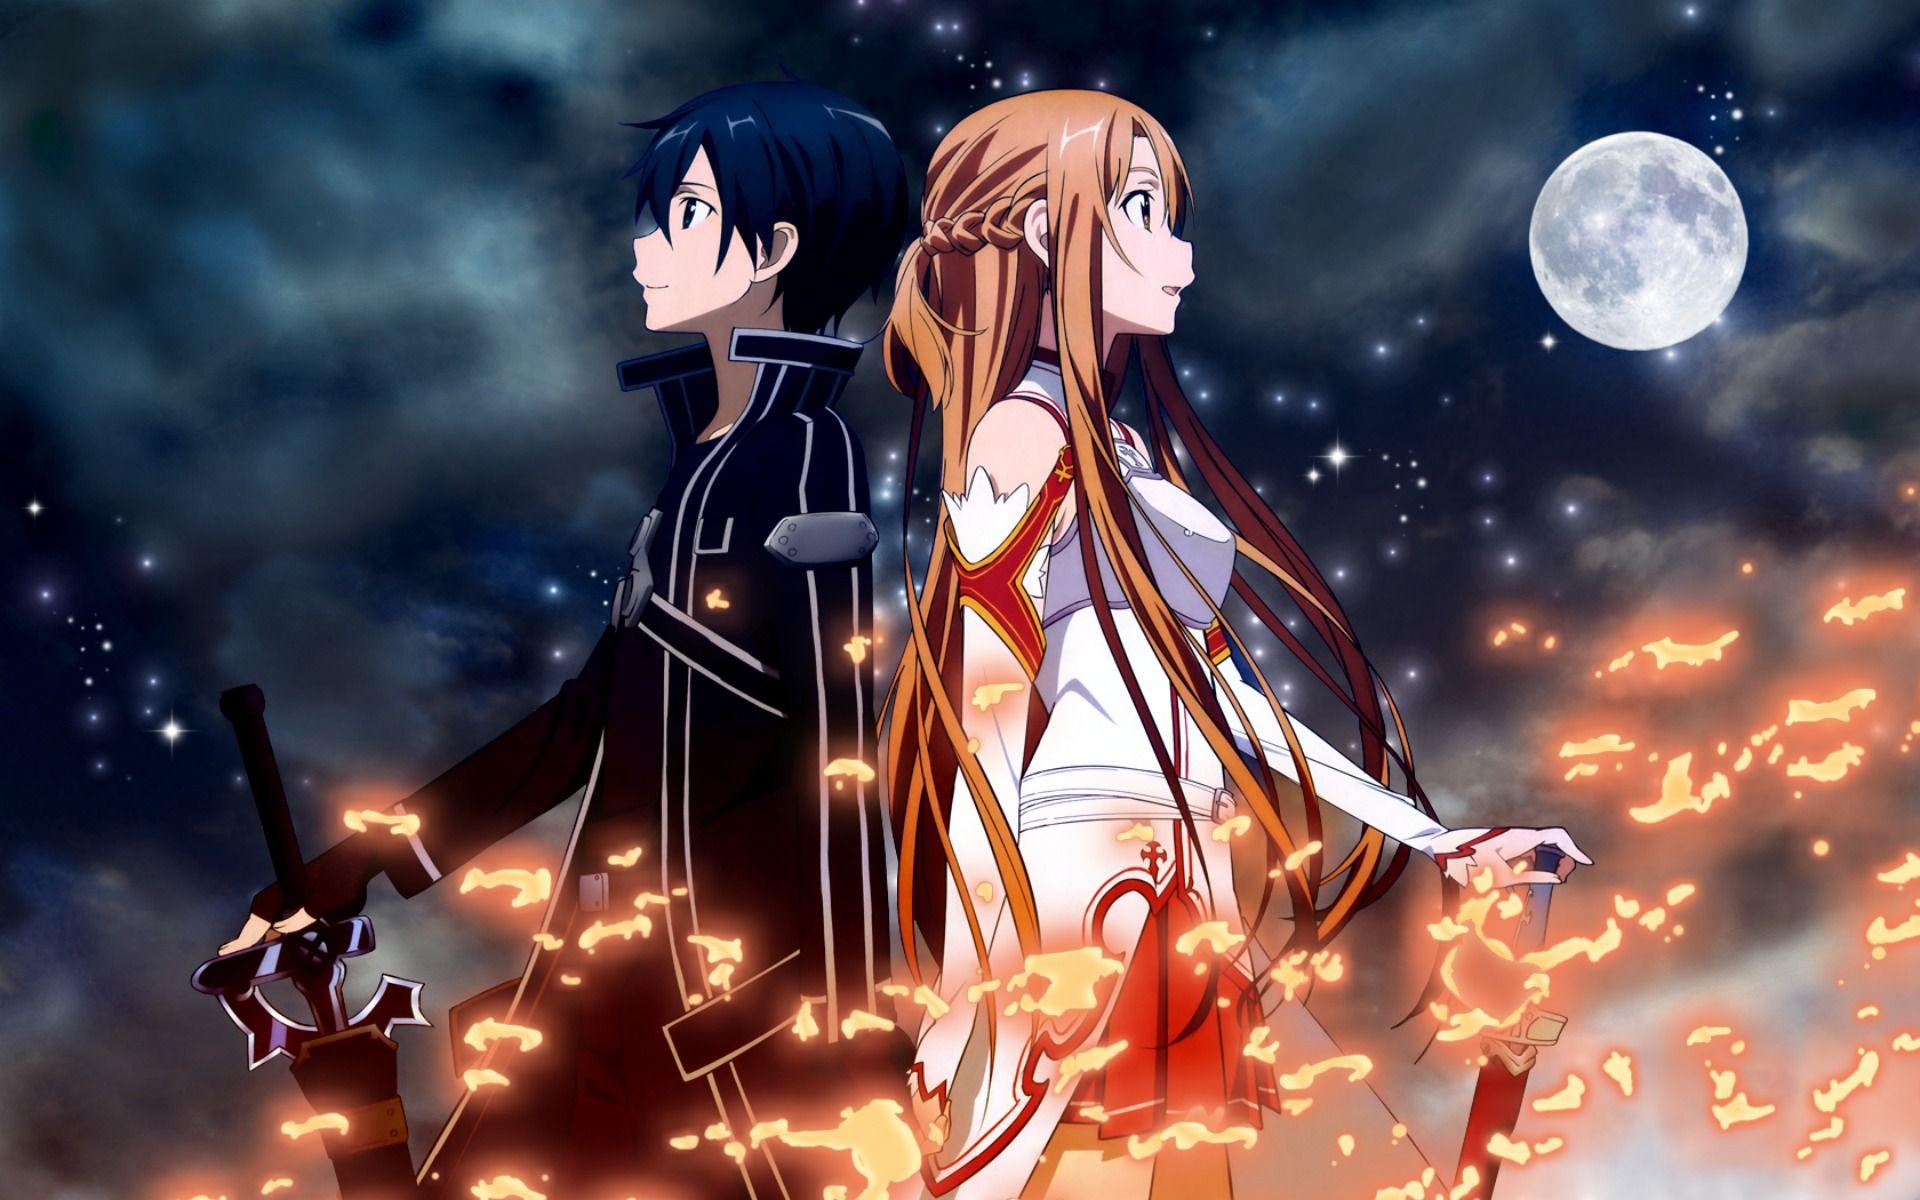 SAO Carta da parati anime, Sword art online, Arte delle